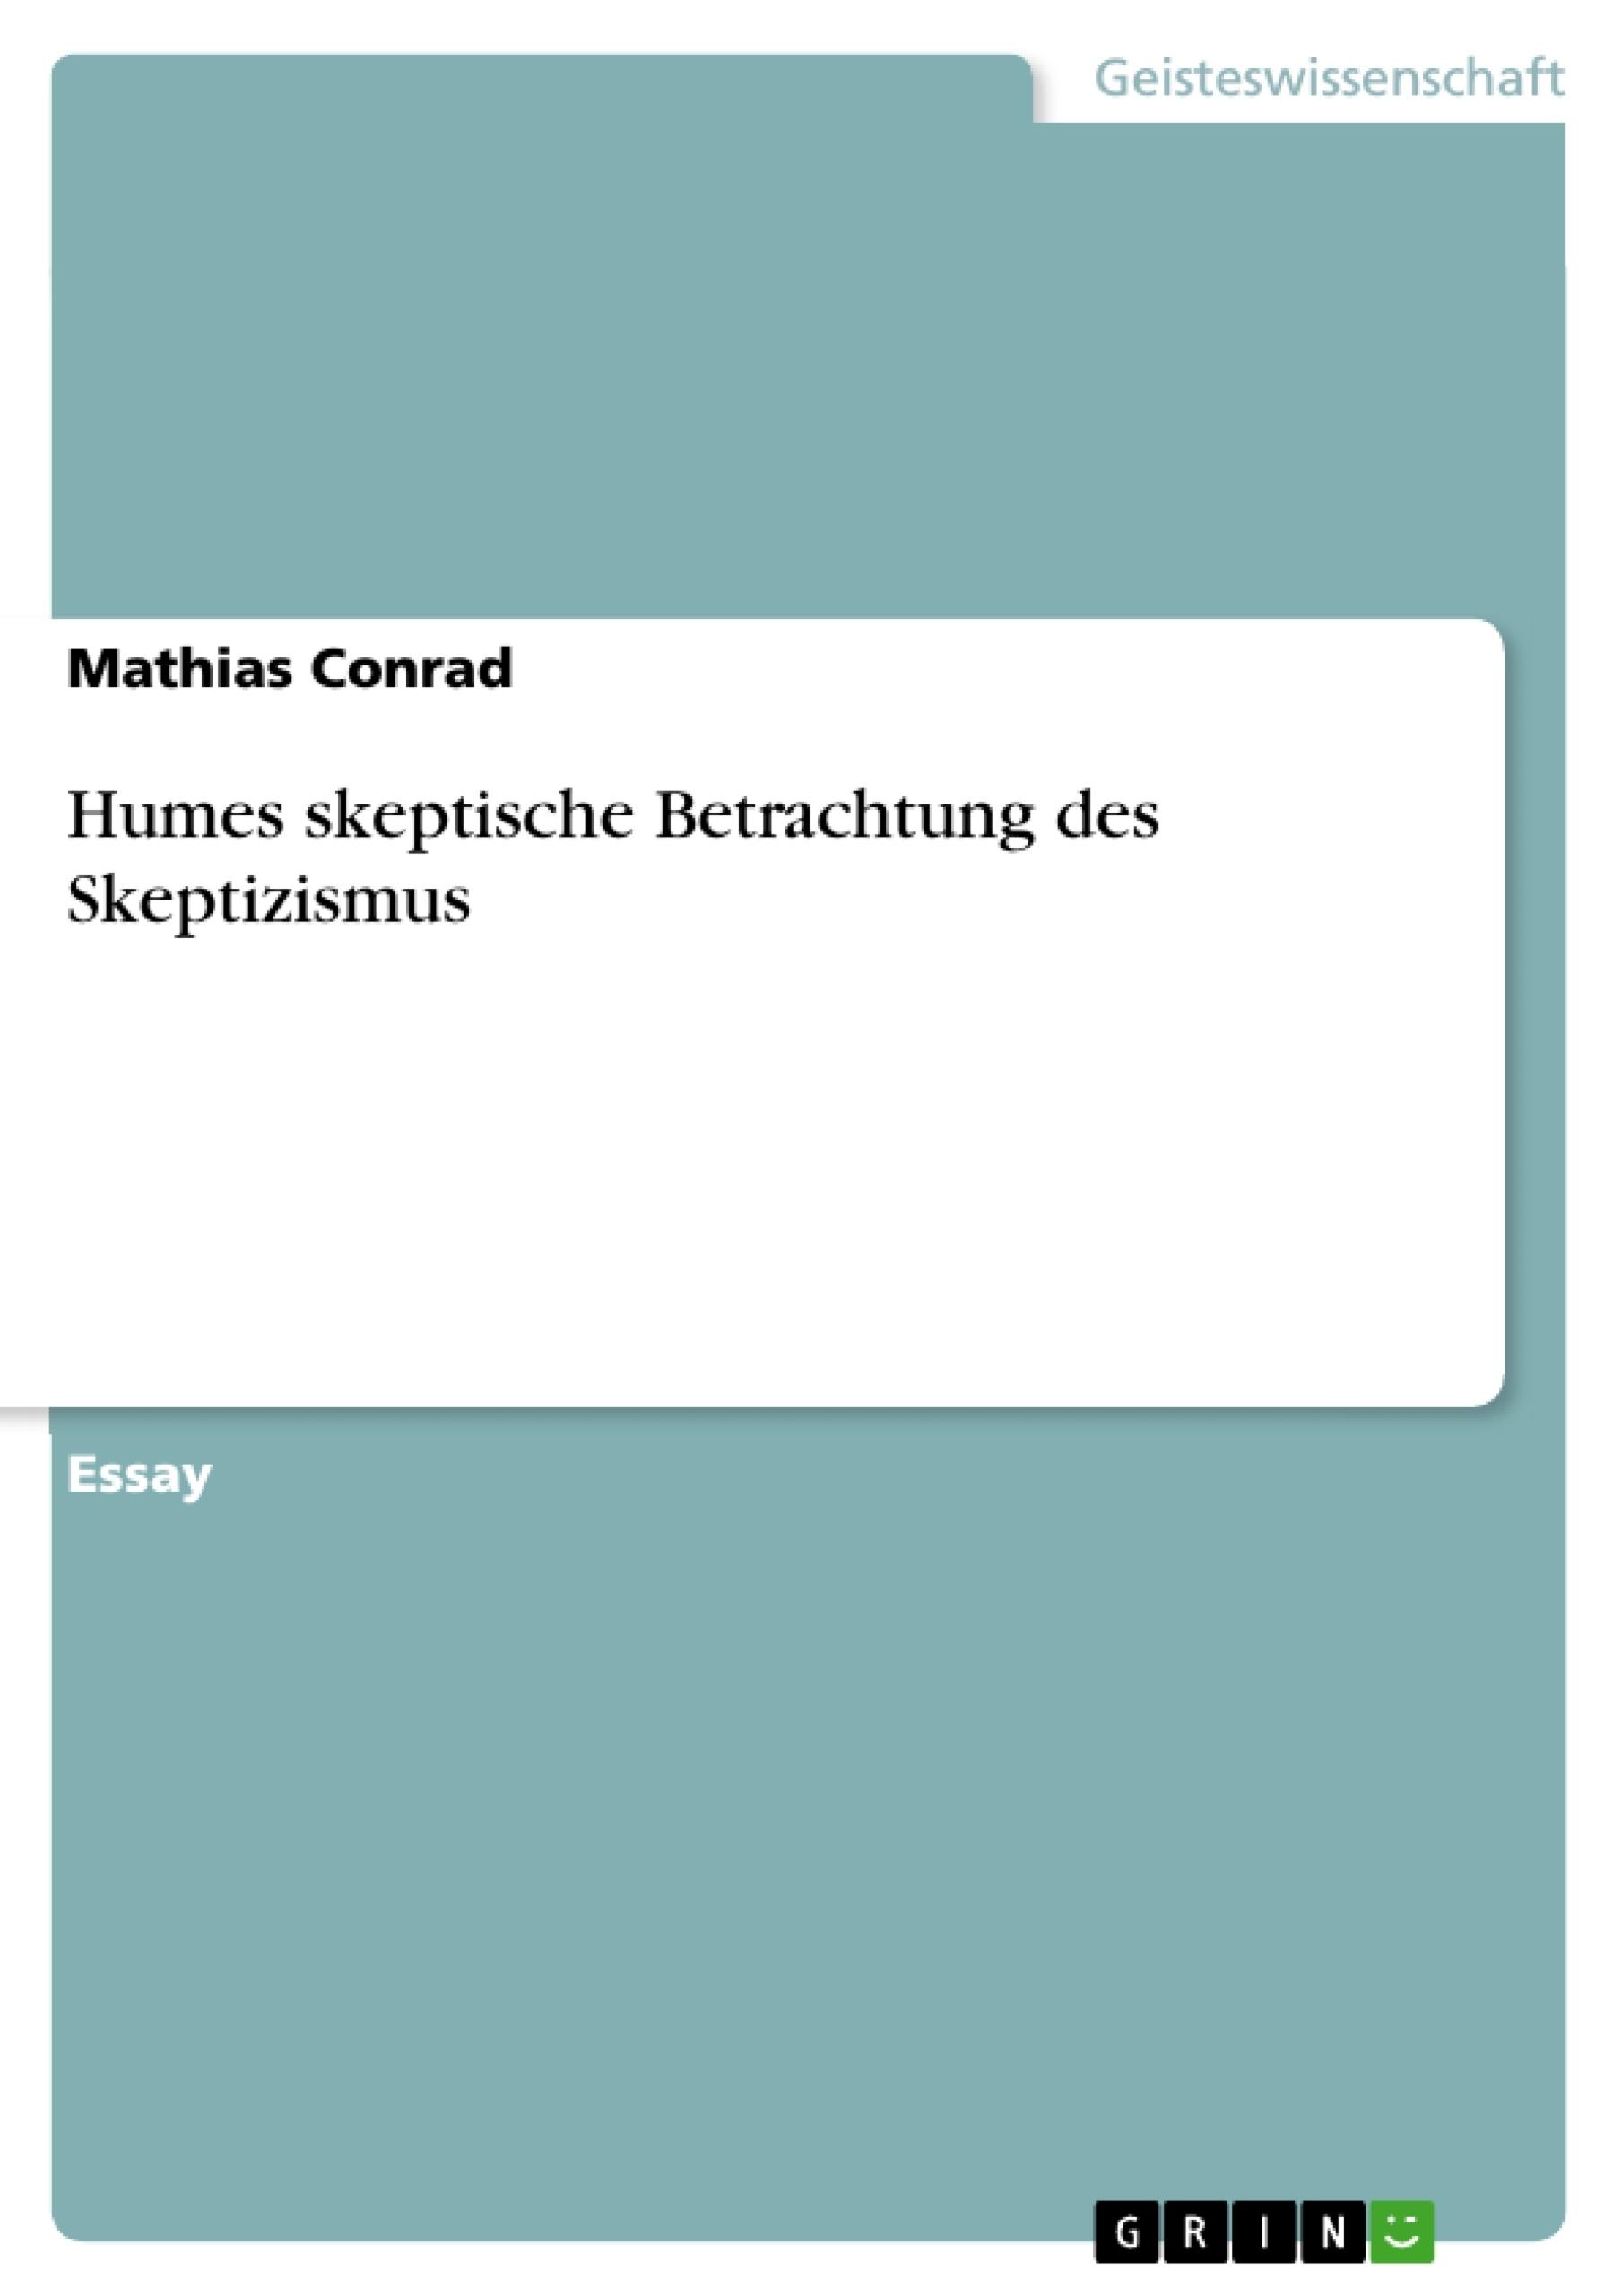 Titel: Humes skeptische Betrachtung des Skeptizismus